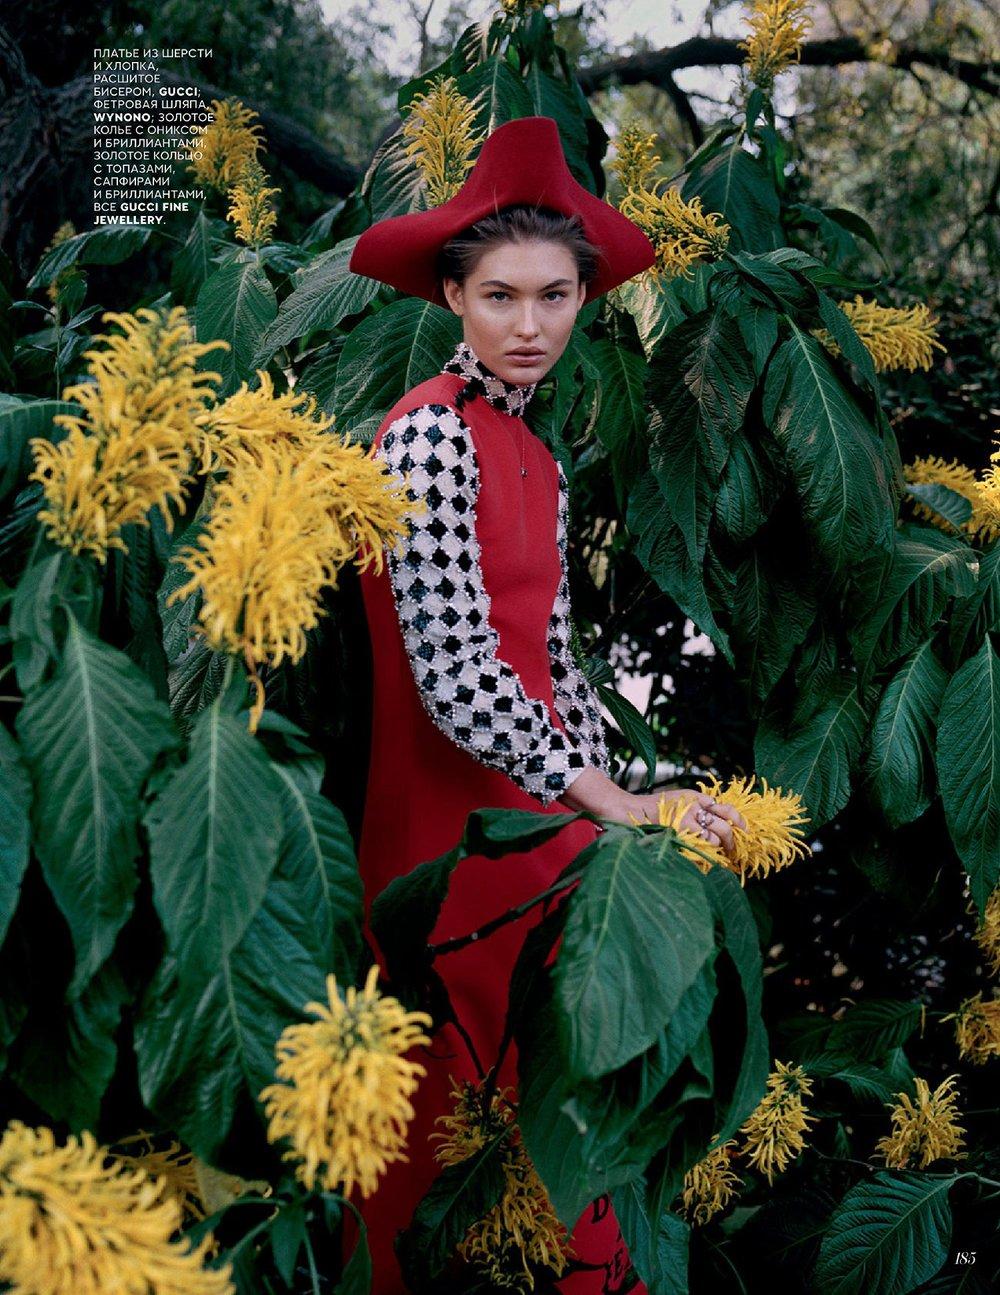 Grace-Elizabeth-Yelena-Yemchuk-Vogue-Russia-April-2019 (6).jpg